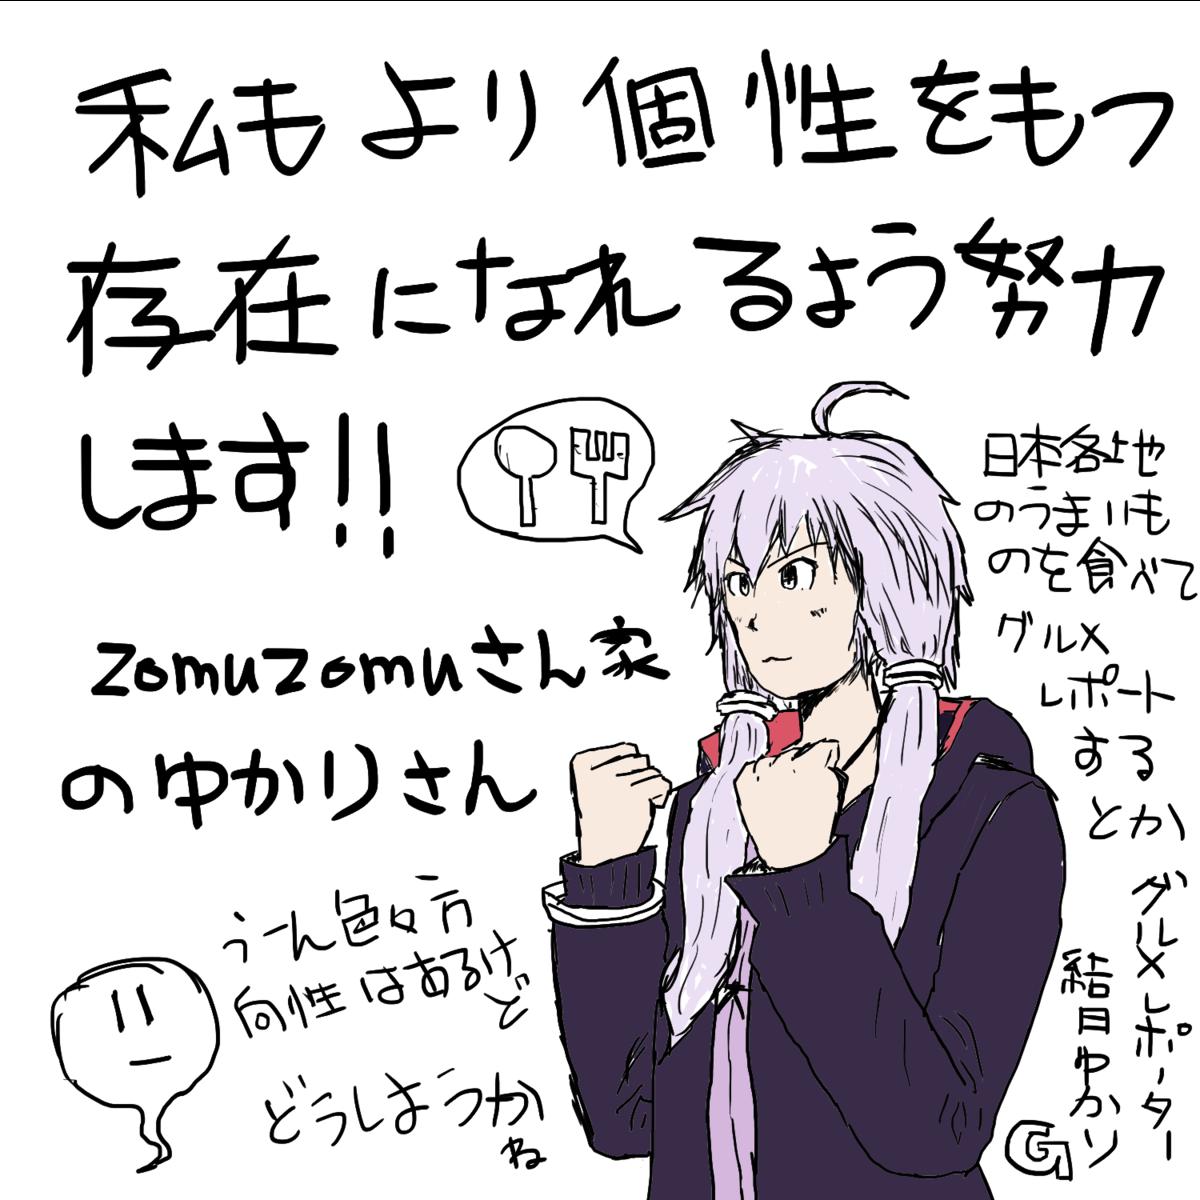 f:id:zomuzomu:20191226130658p:plain